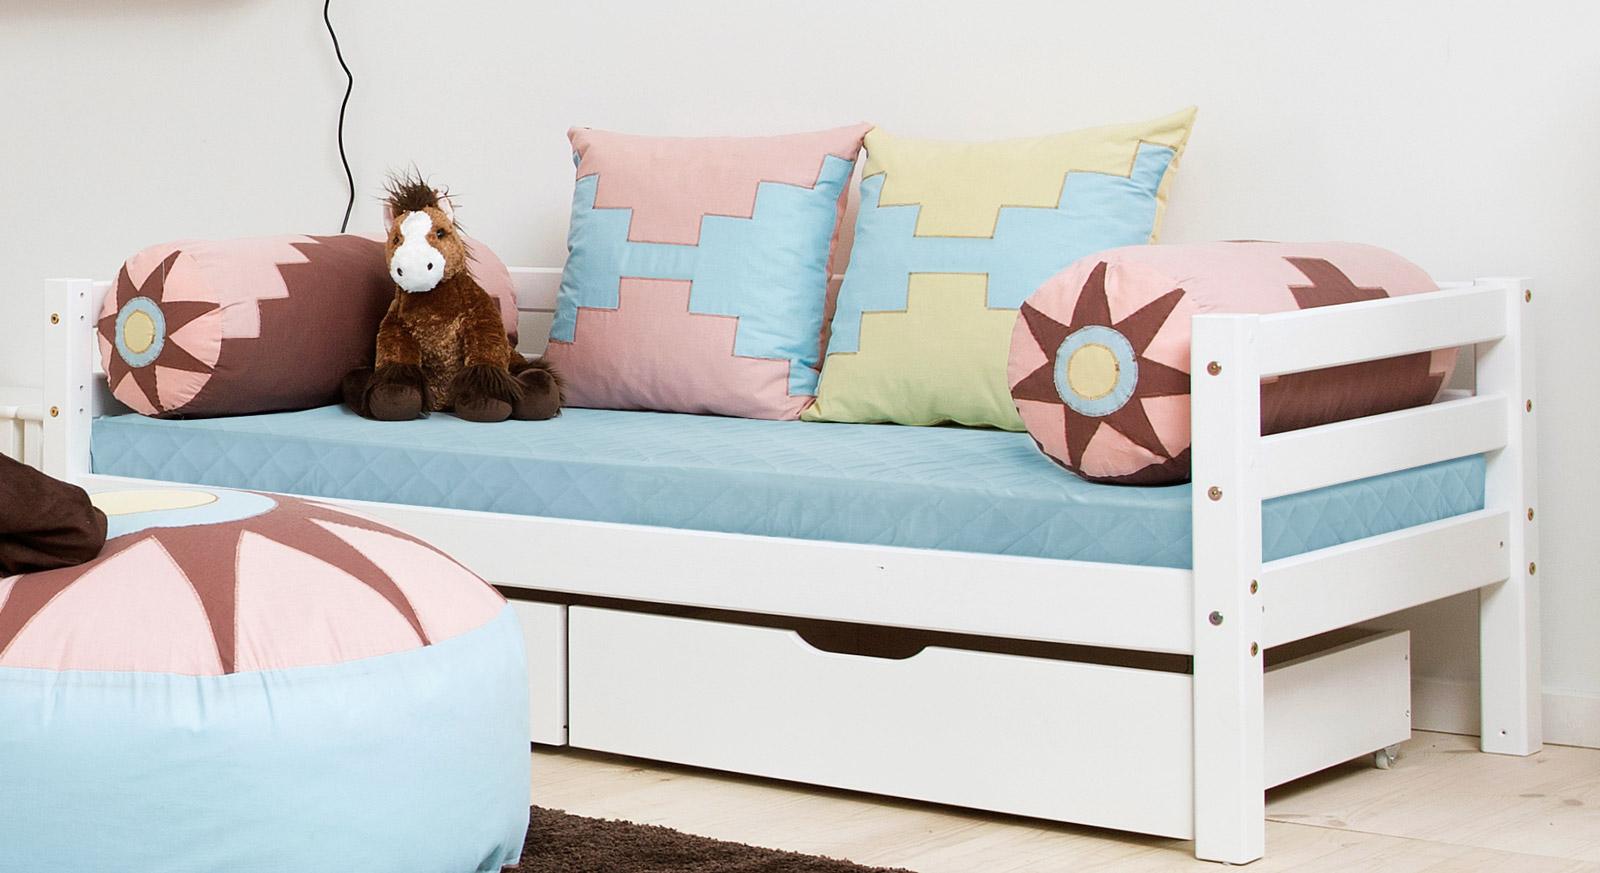 bunte motiv dekokissen f r kinderzimmer kids heaven. Black Bedroom Furniture Sets. Home Design Ideas